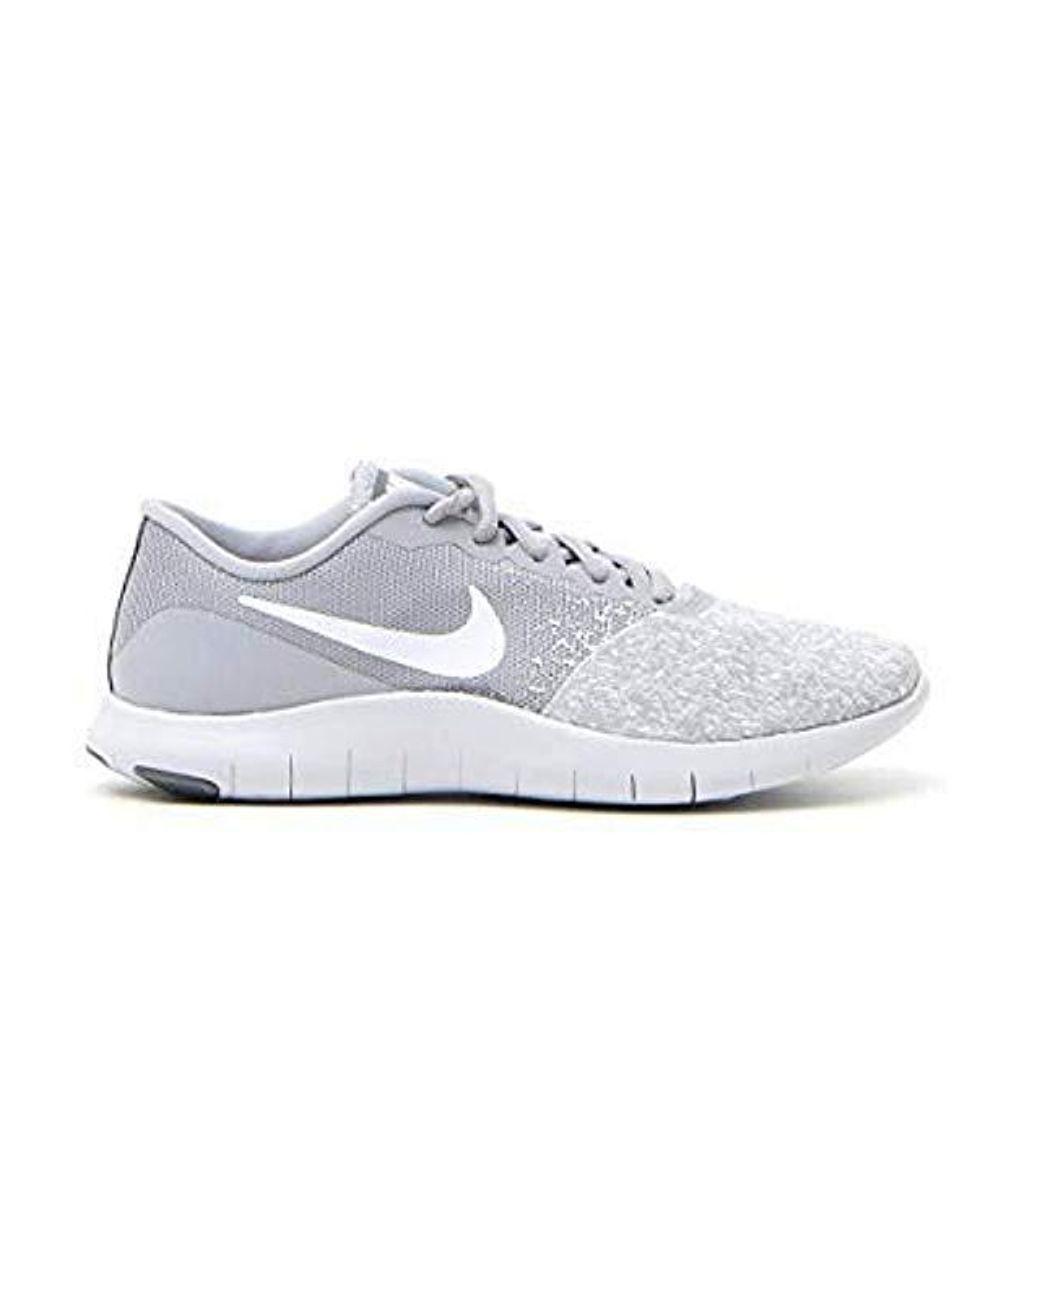 Sports \u0026 Fitness Women's Nike Womens